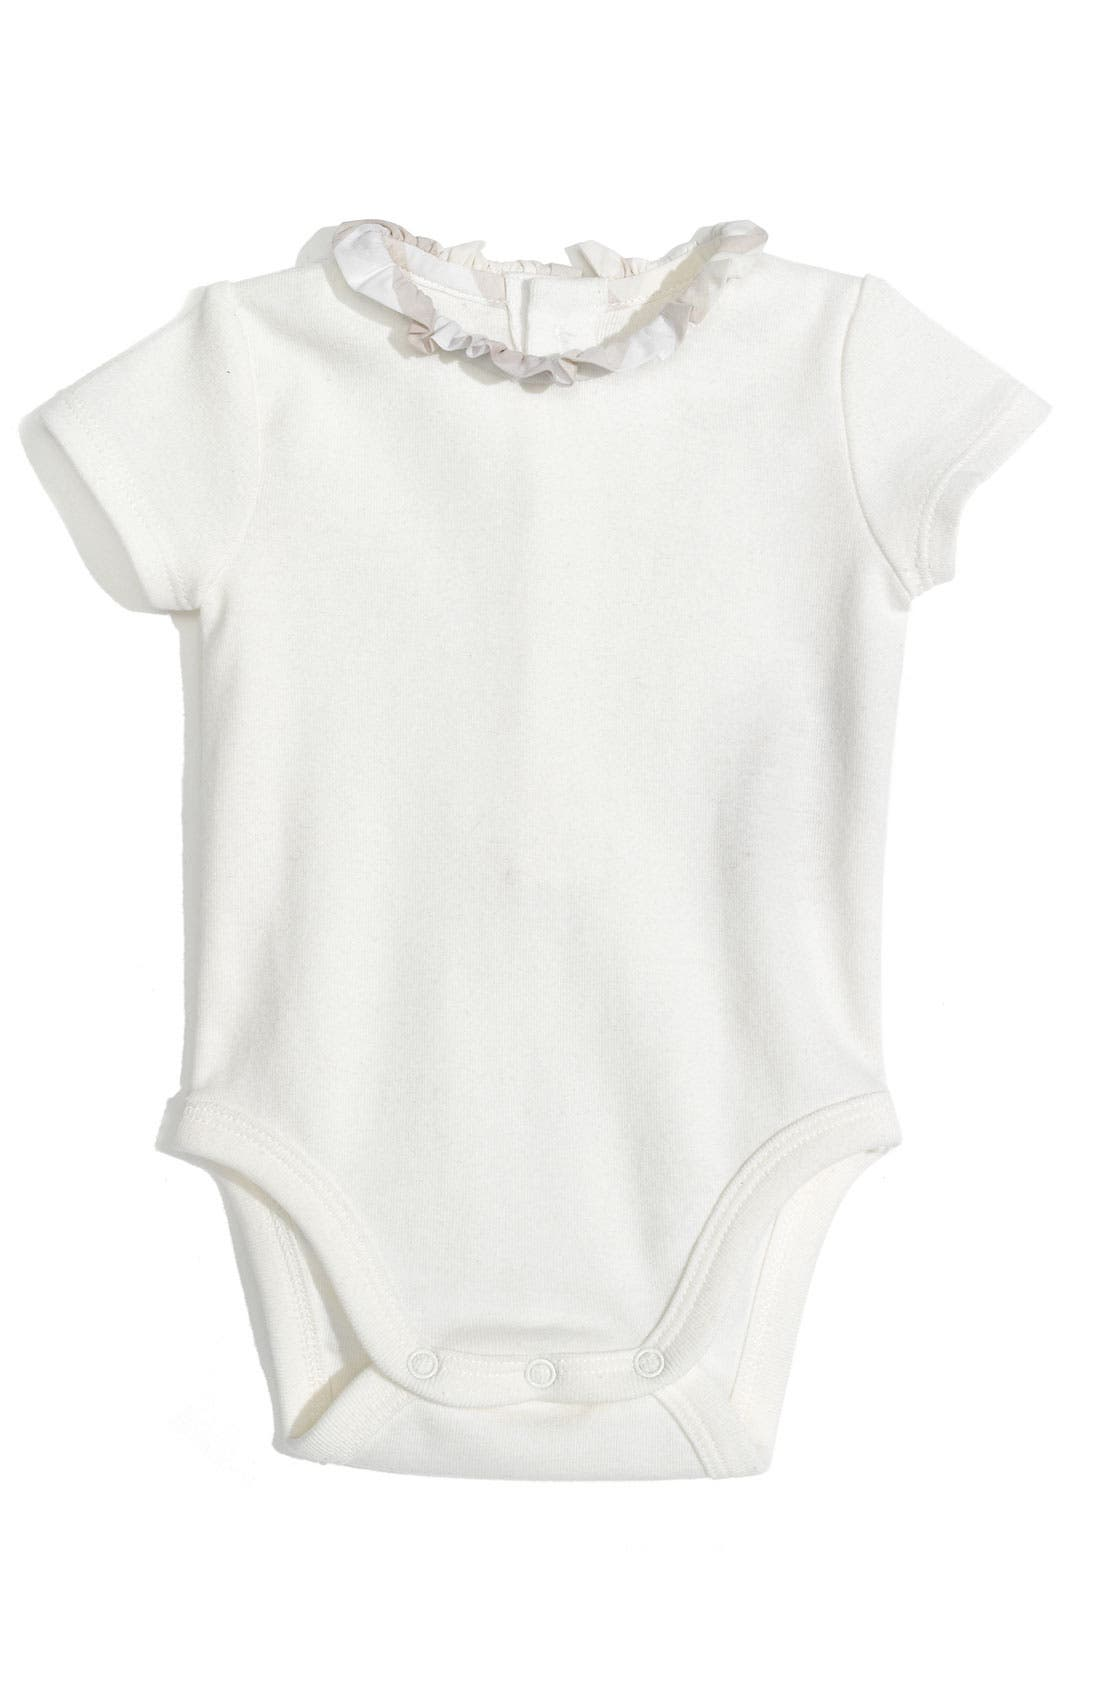 Main Image - Burberry 'Audrey' Ruffle Collar Bodysuit (Infant)